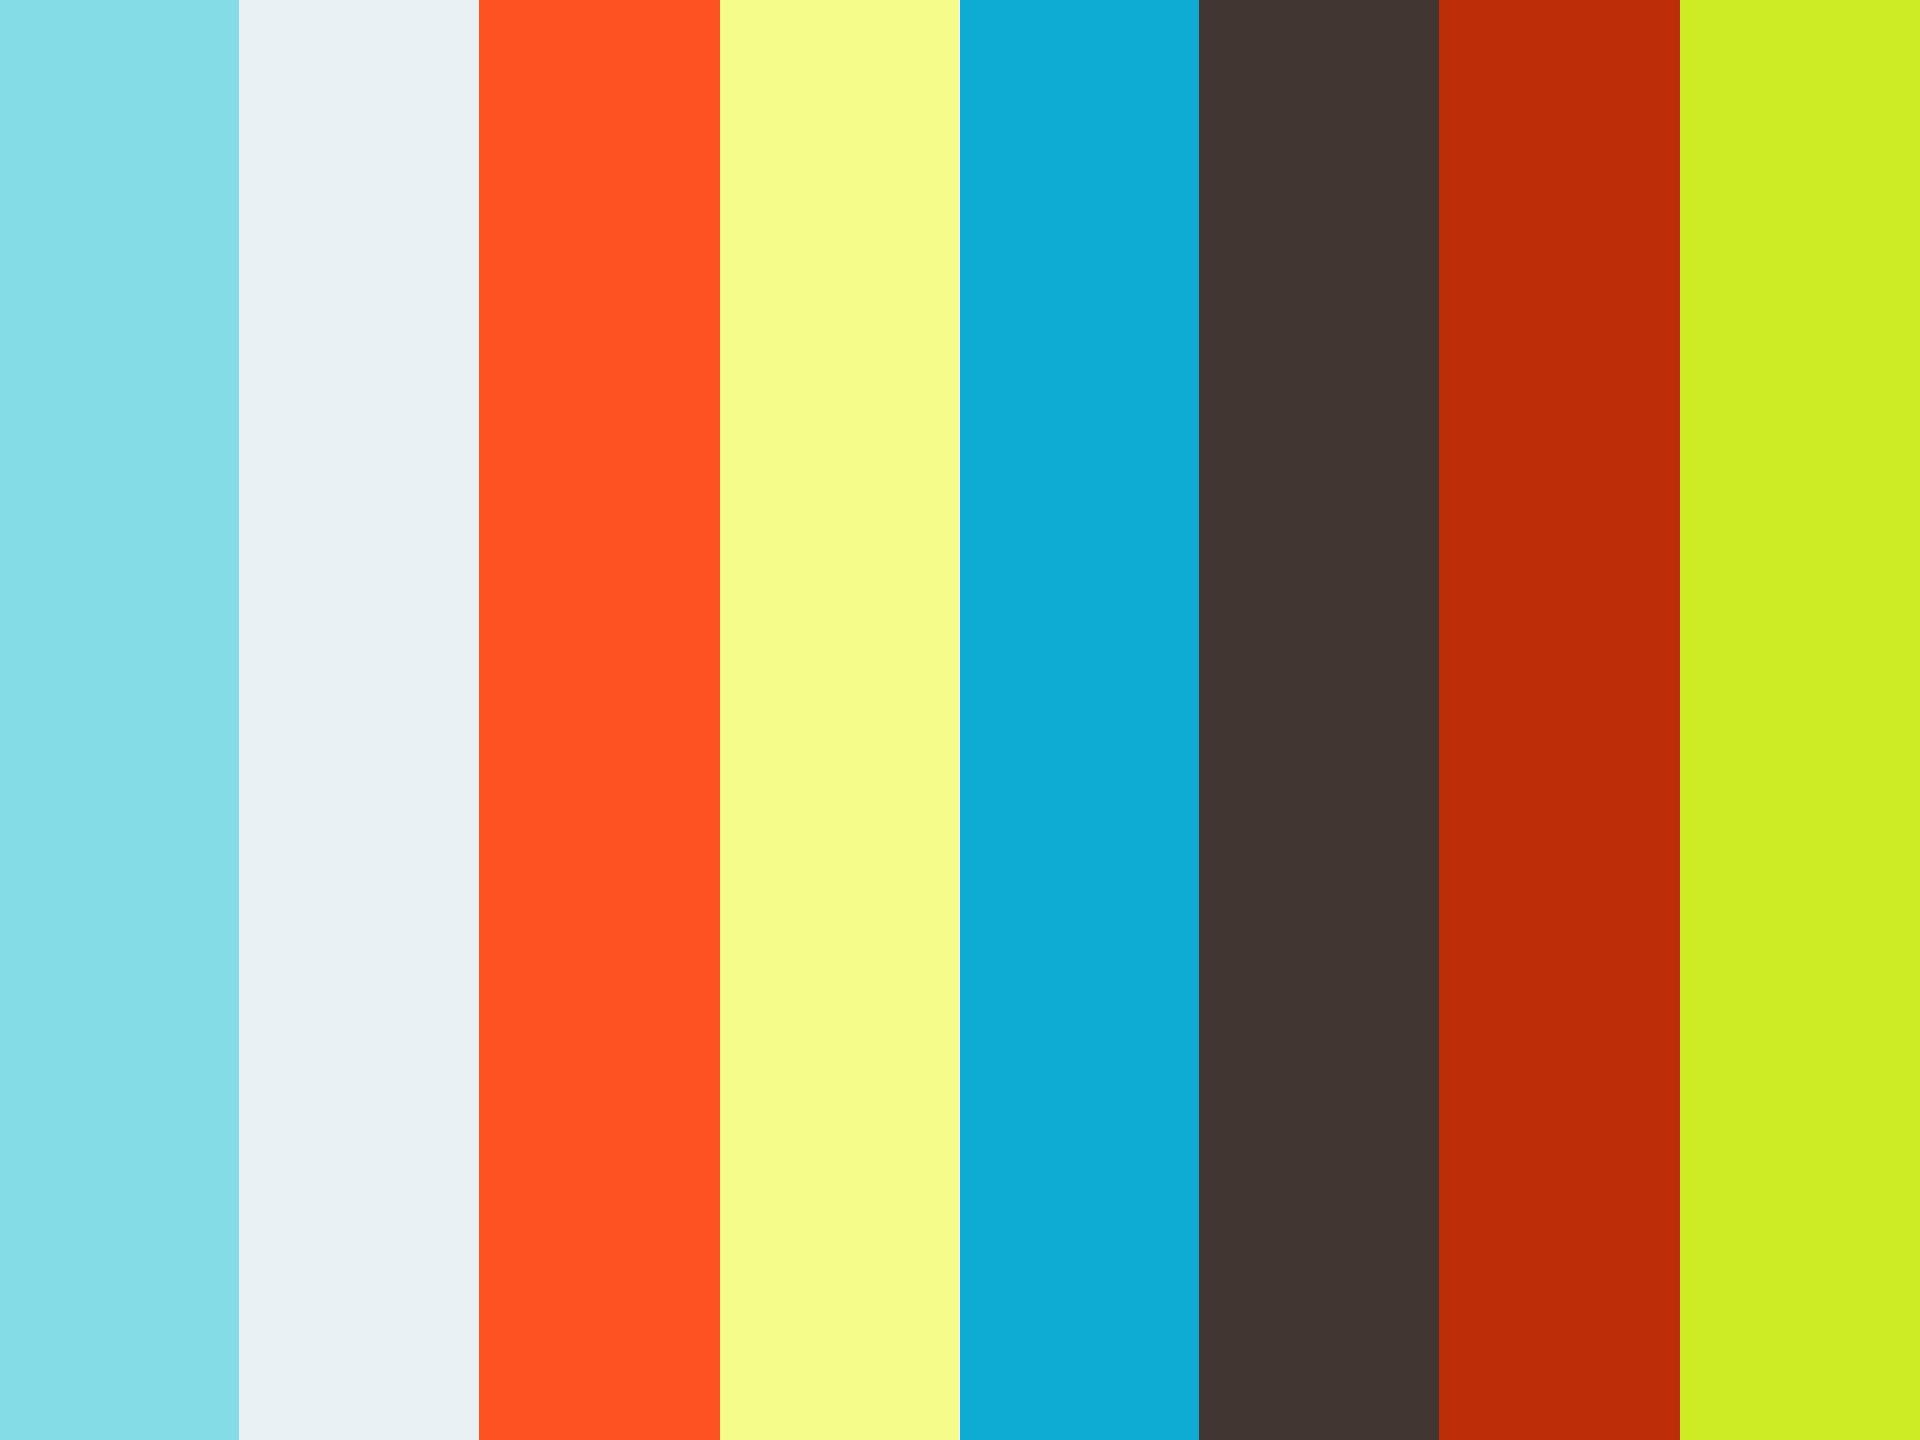 https://i.vimeocdn.com/filter/overlay?src0=https%3A%2F%2Fi.vimeocdn.com%2Fvideo%2F752325537_1280x720.webp&src1=https%3A%2F%2Ff.vimeocdn.com%2Fimages_v6%2Fshare%2Fplay_icon_overlay.png